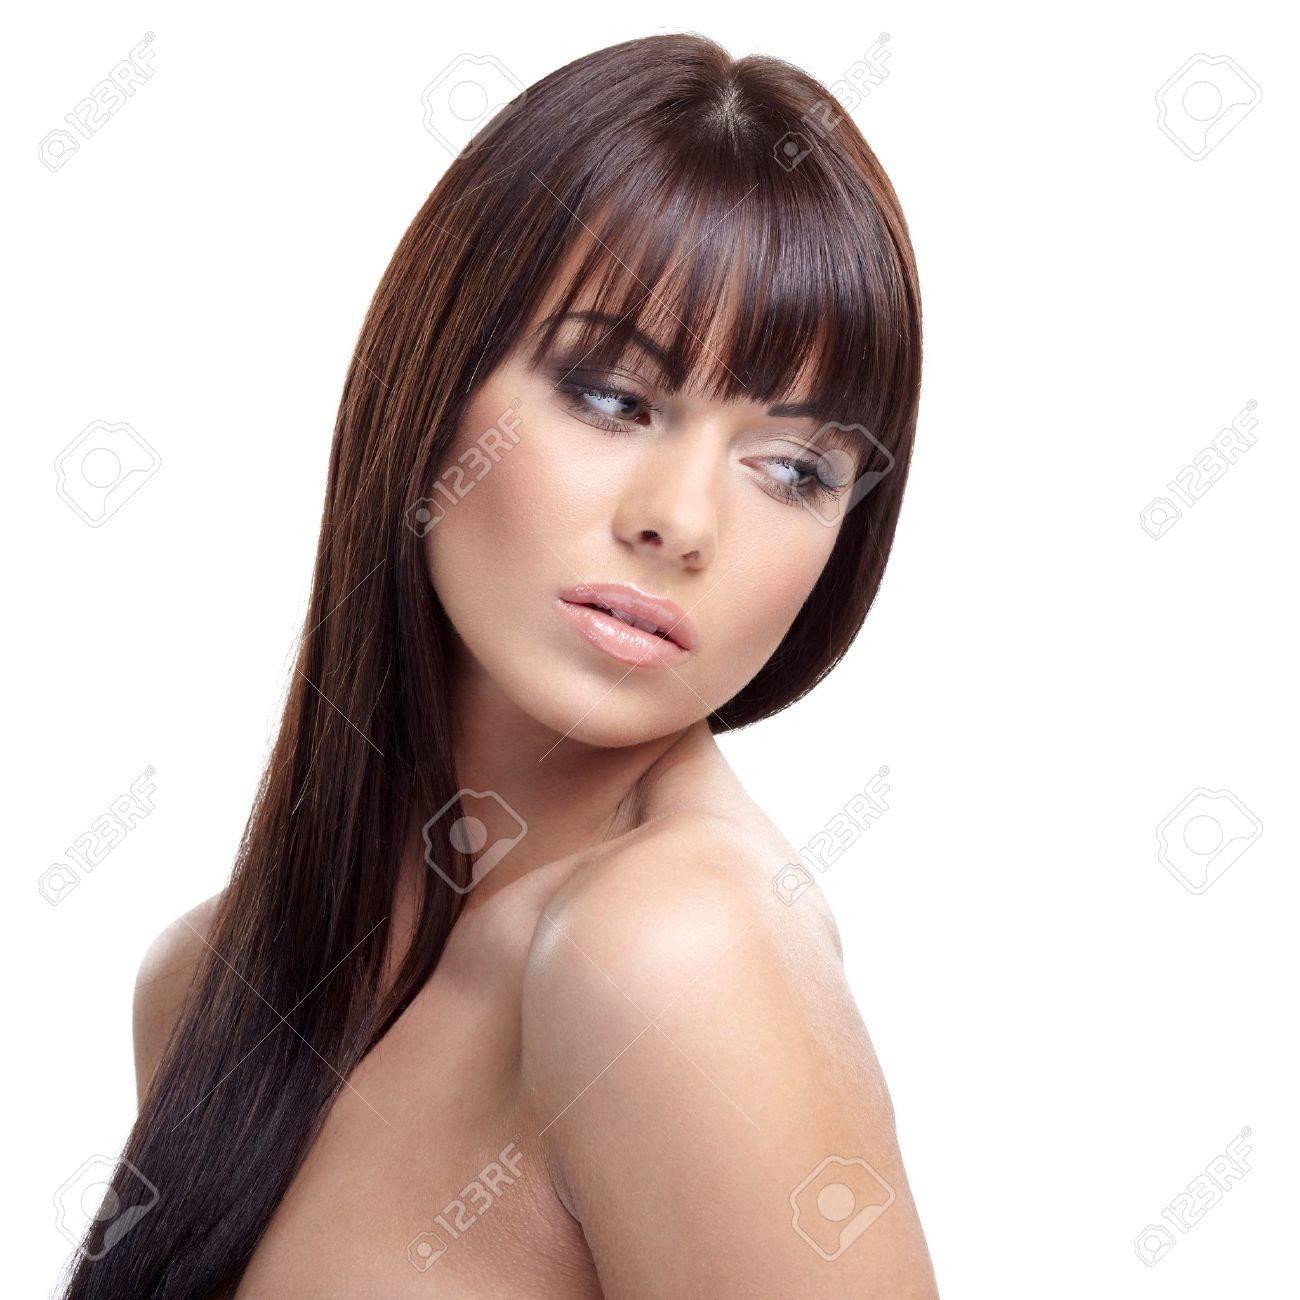 Portrait of beautiful female model on white background Stock Photo - 16796441